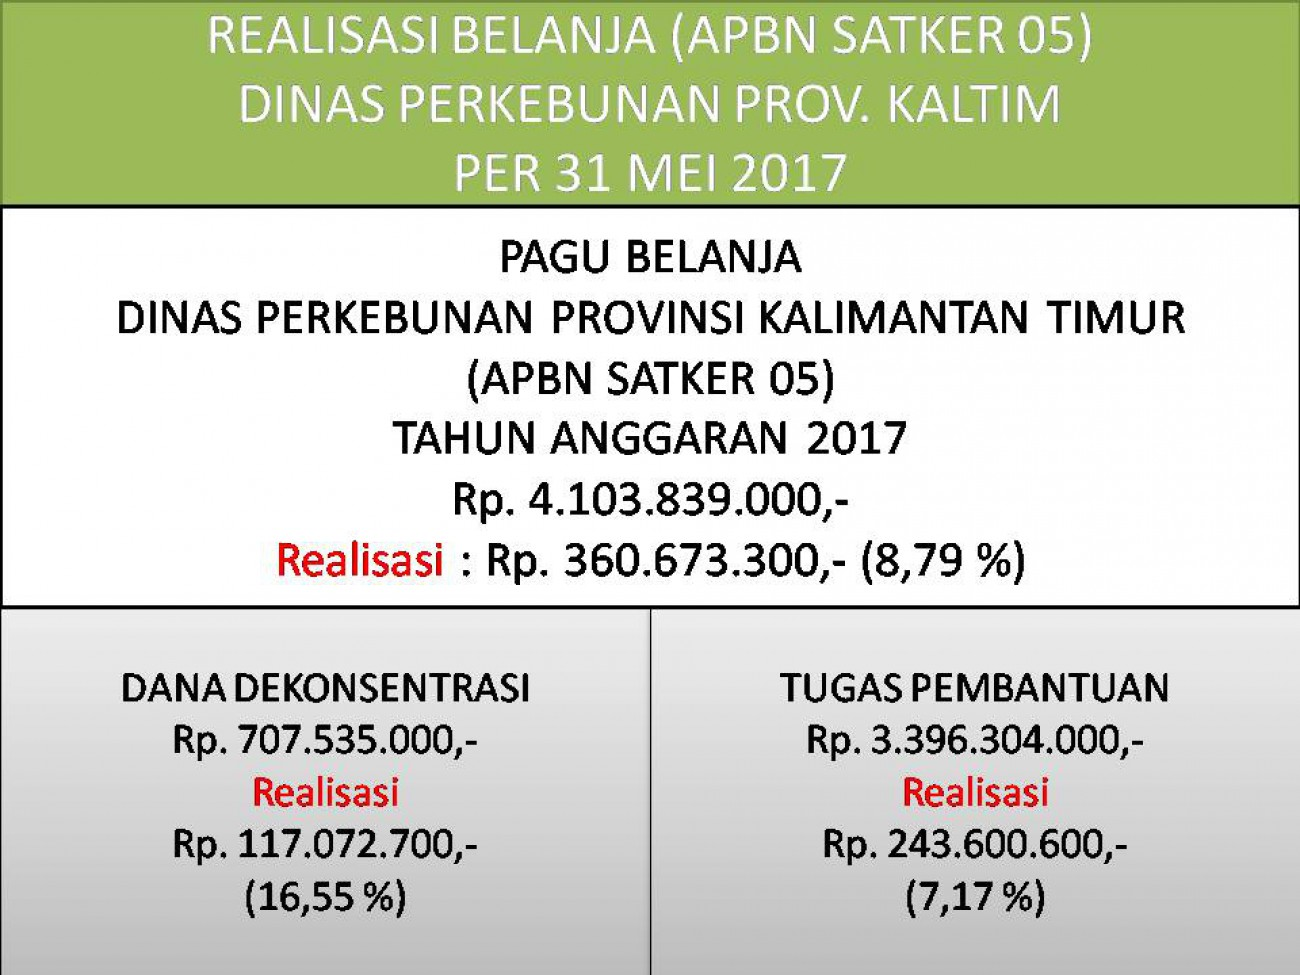 Laporan Realisasi APBN Satker 05 (Direktorat Jenderal Perkebunan) Dinas Perkebunan Prov. Kaltim Bulan Mei 2017